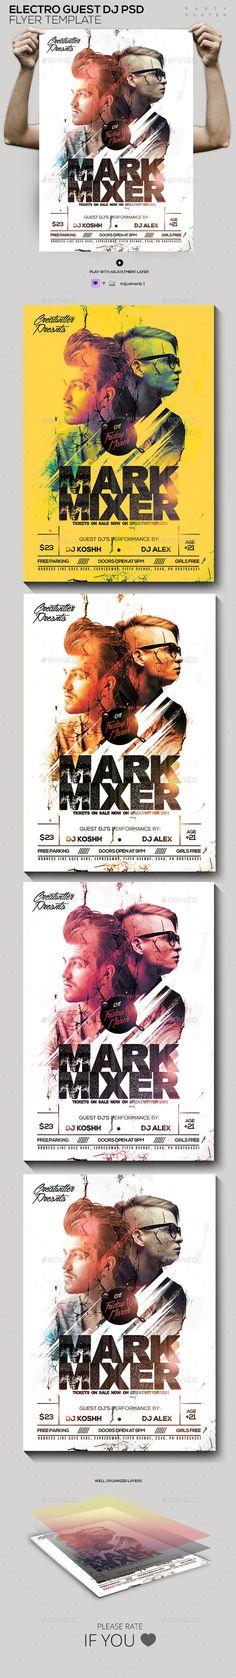 Guest DJ's PSD Poster/Flyer Template #design Download: http://graphicriver.net/item/guest-djs-psd-posterflyer-template/12072580?ref=ksioks